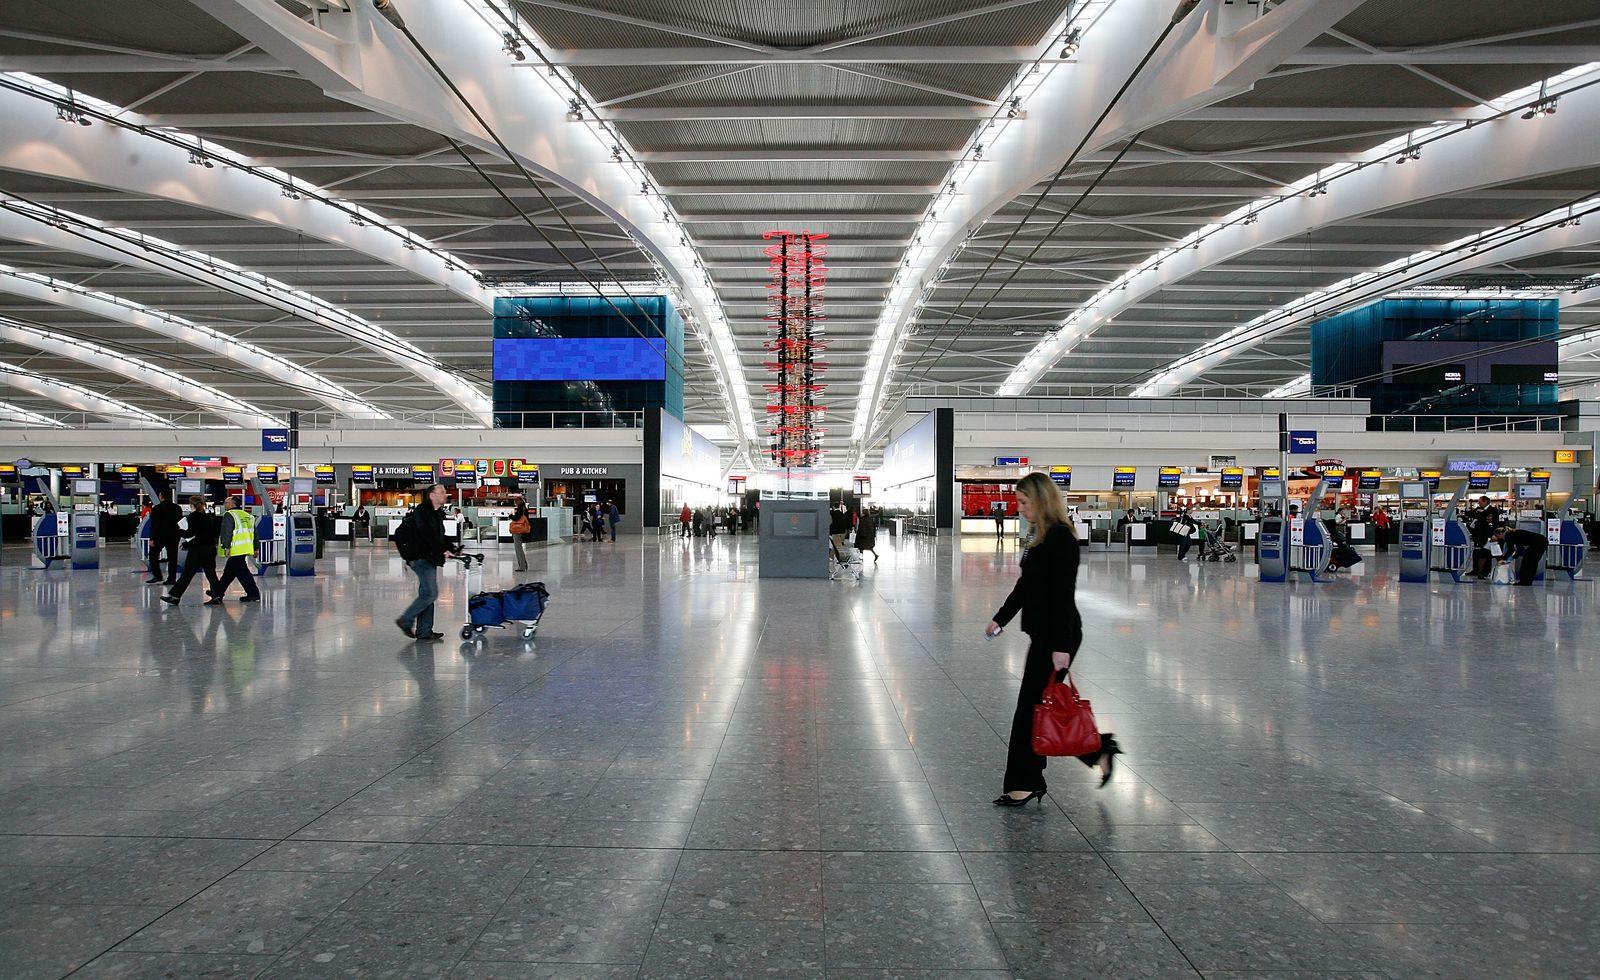 Flughafen Heathrow